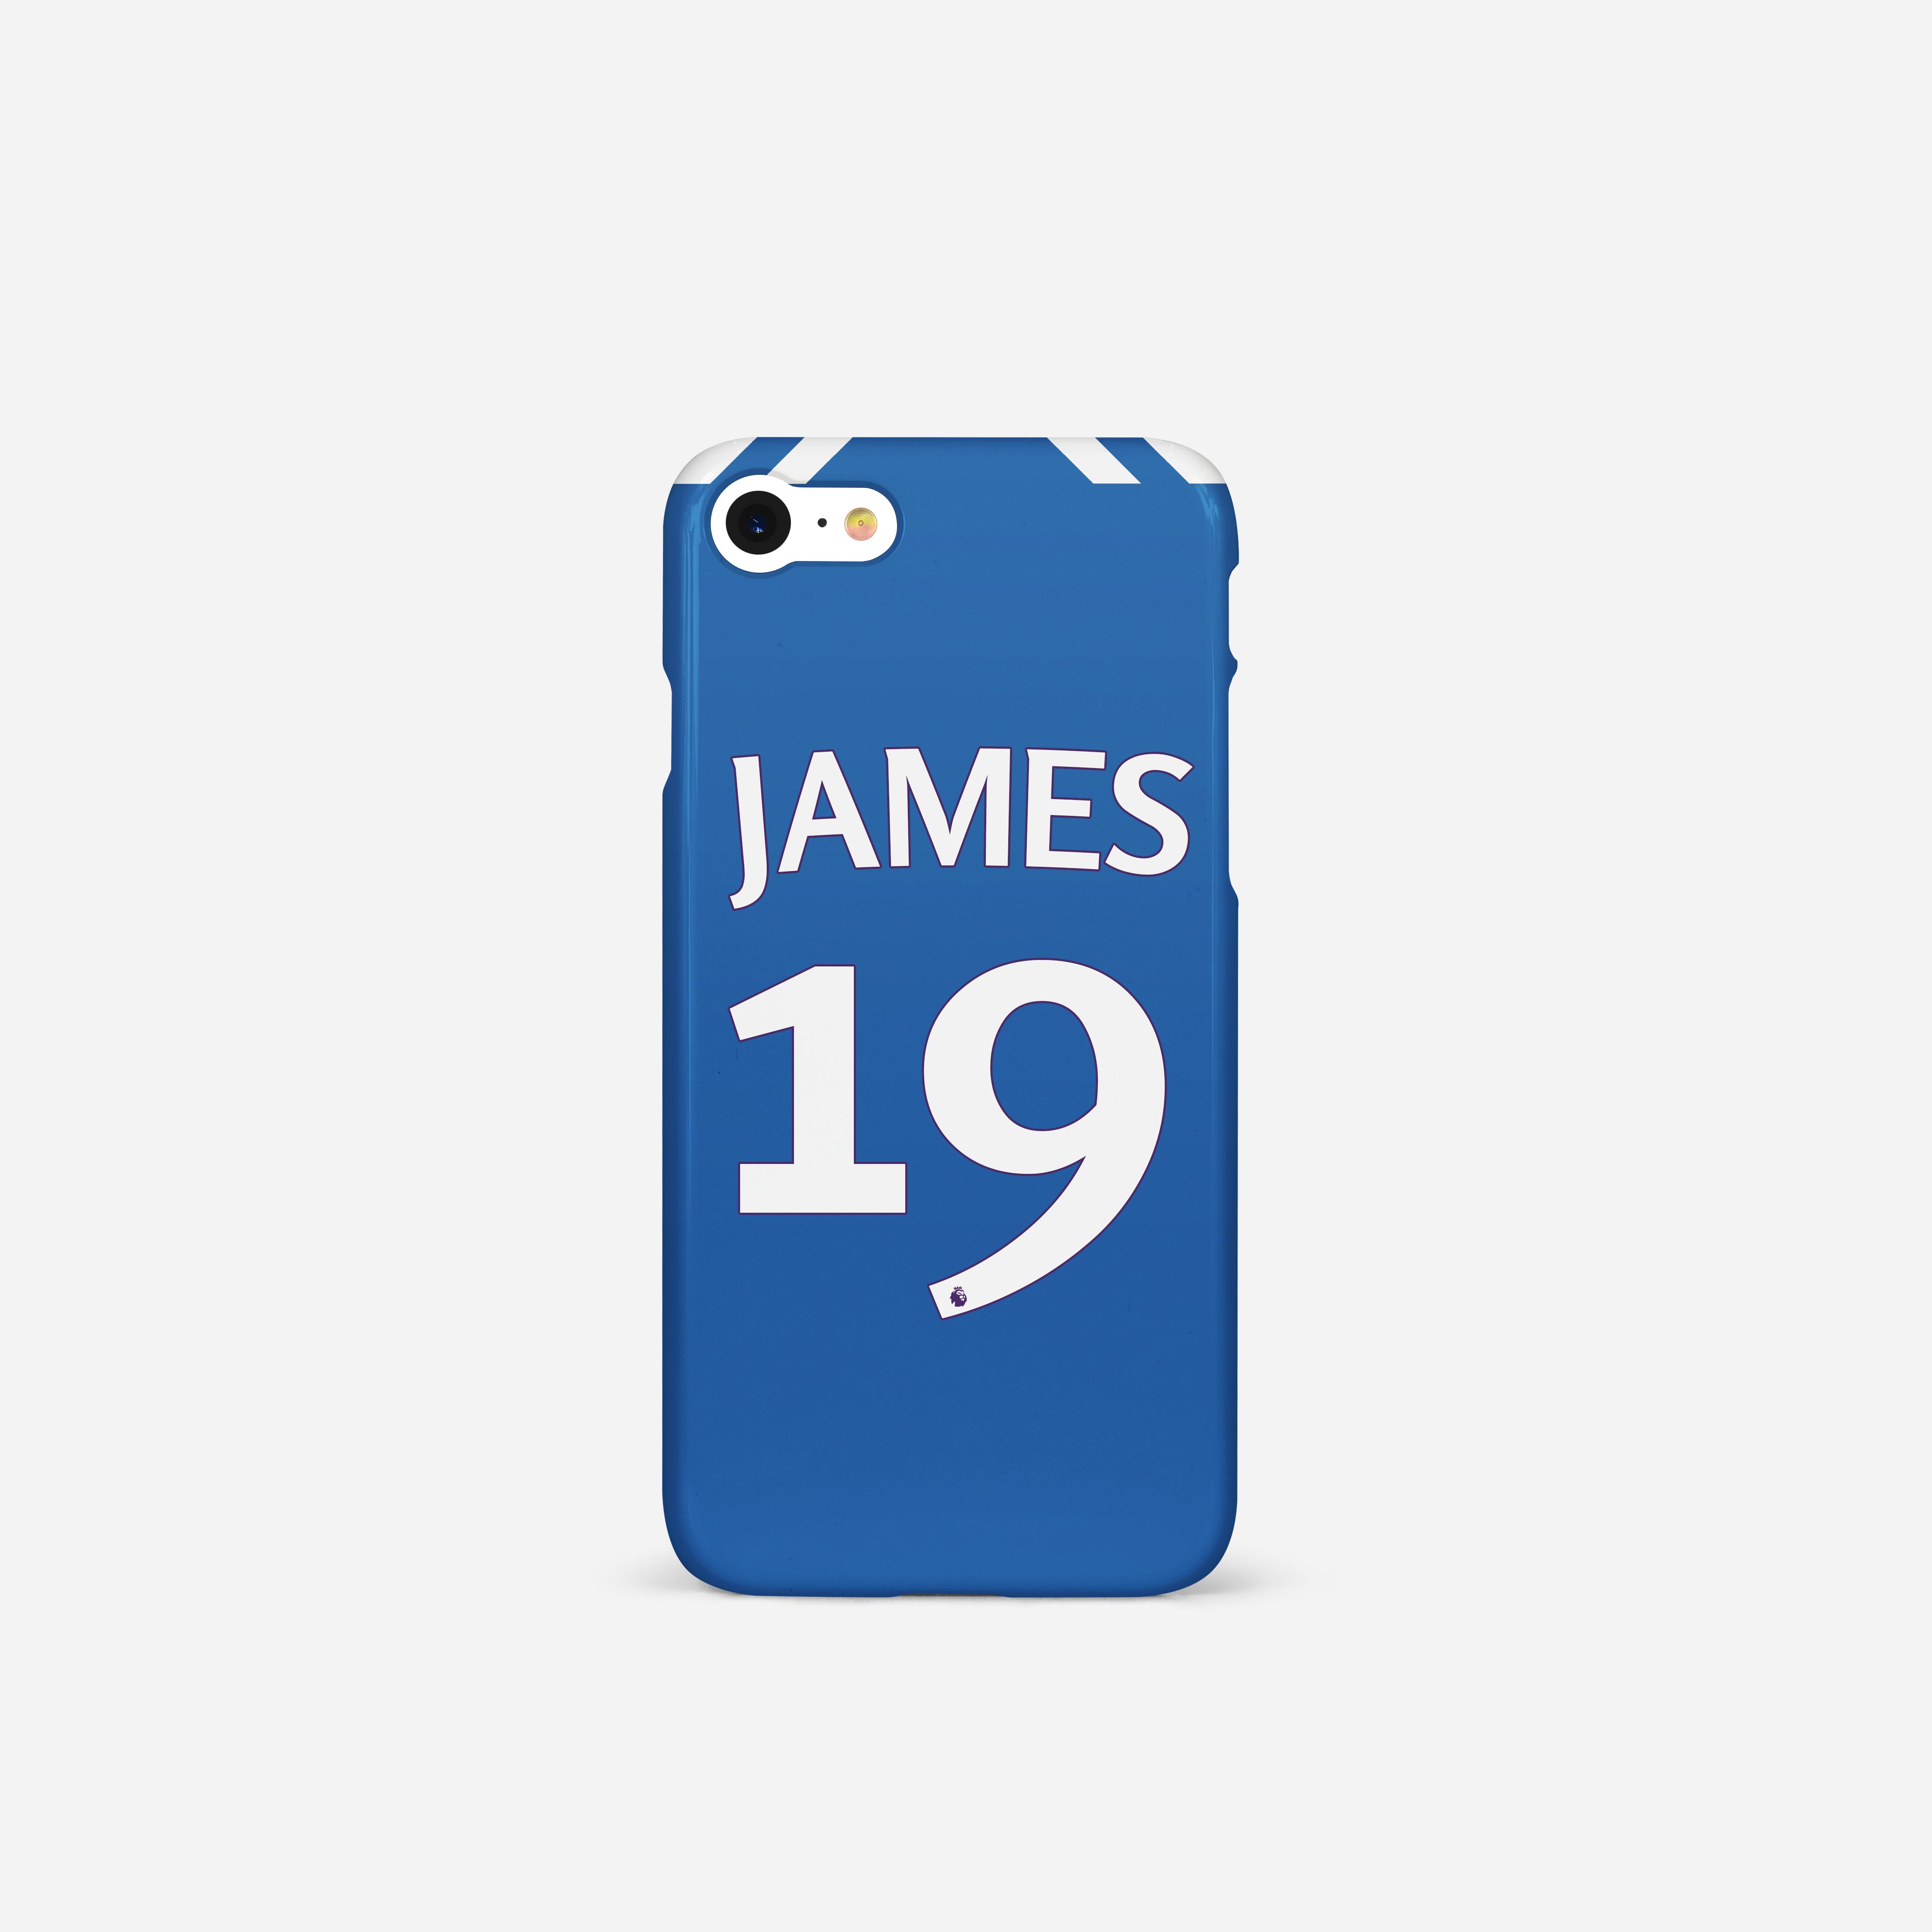 James Rodriguez Everton 19 Phone Cases Case Phone